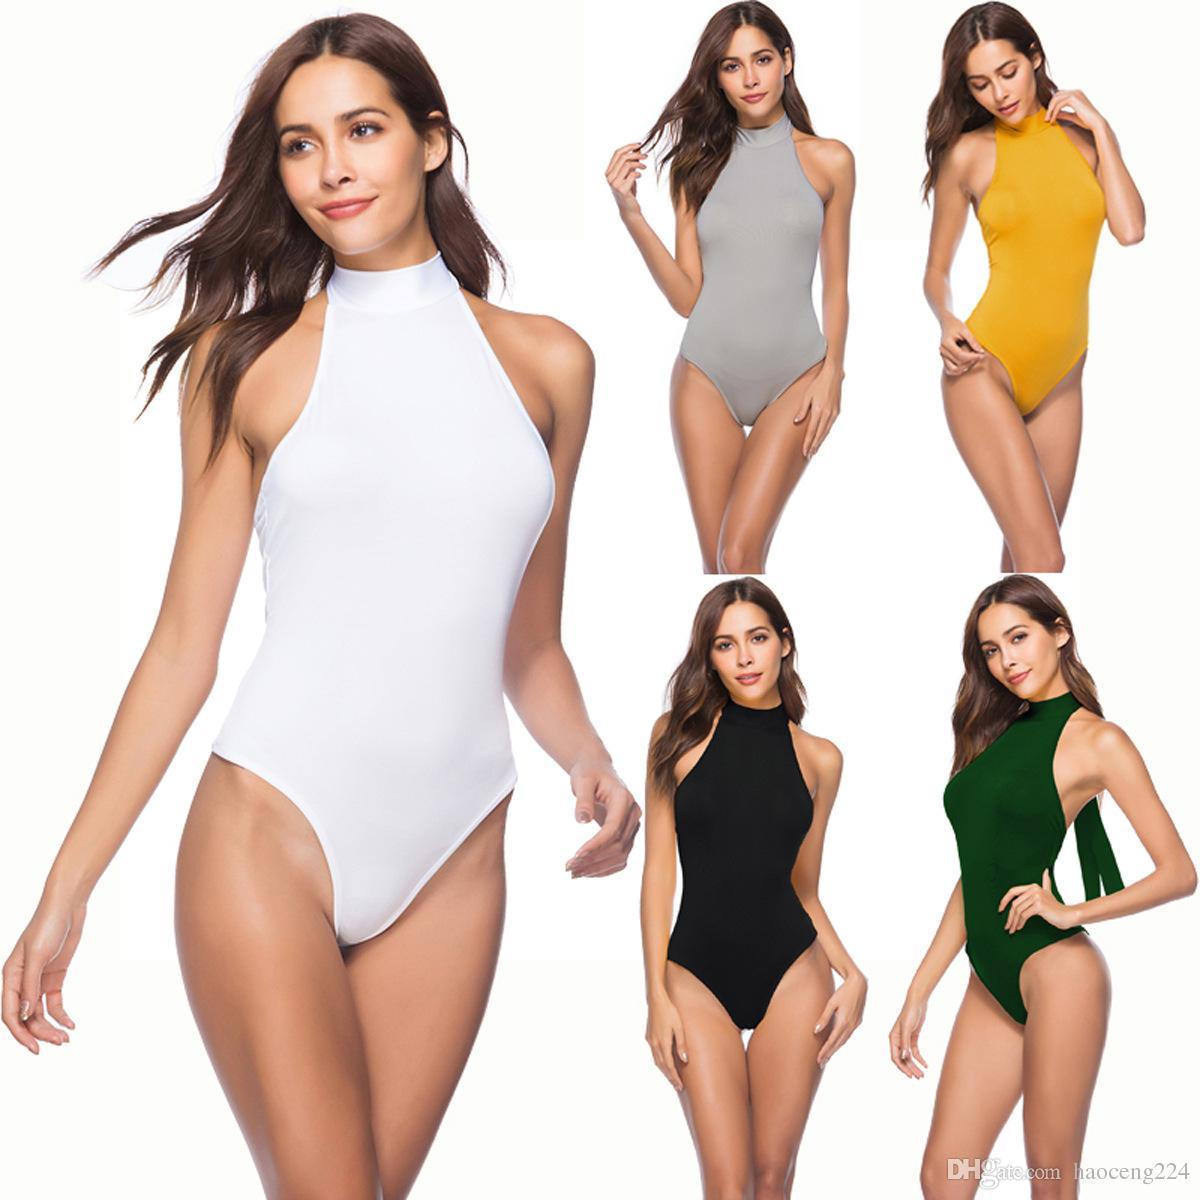 36bc9f7f02d9 2019 One Piece Swimsuit Sexy Women Swinwear Candy Color Bikini Bodysuit  Solid Slim Halter Hip Up Backless Women Bathing Suit Beachwear Monokini From  ...